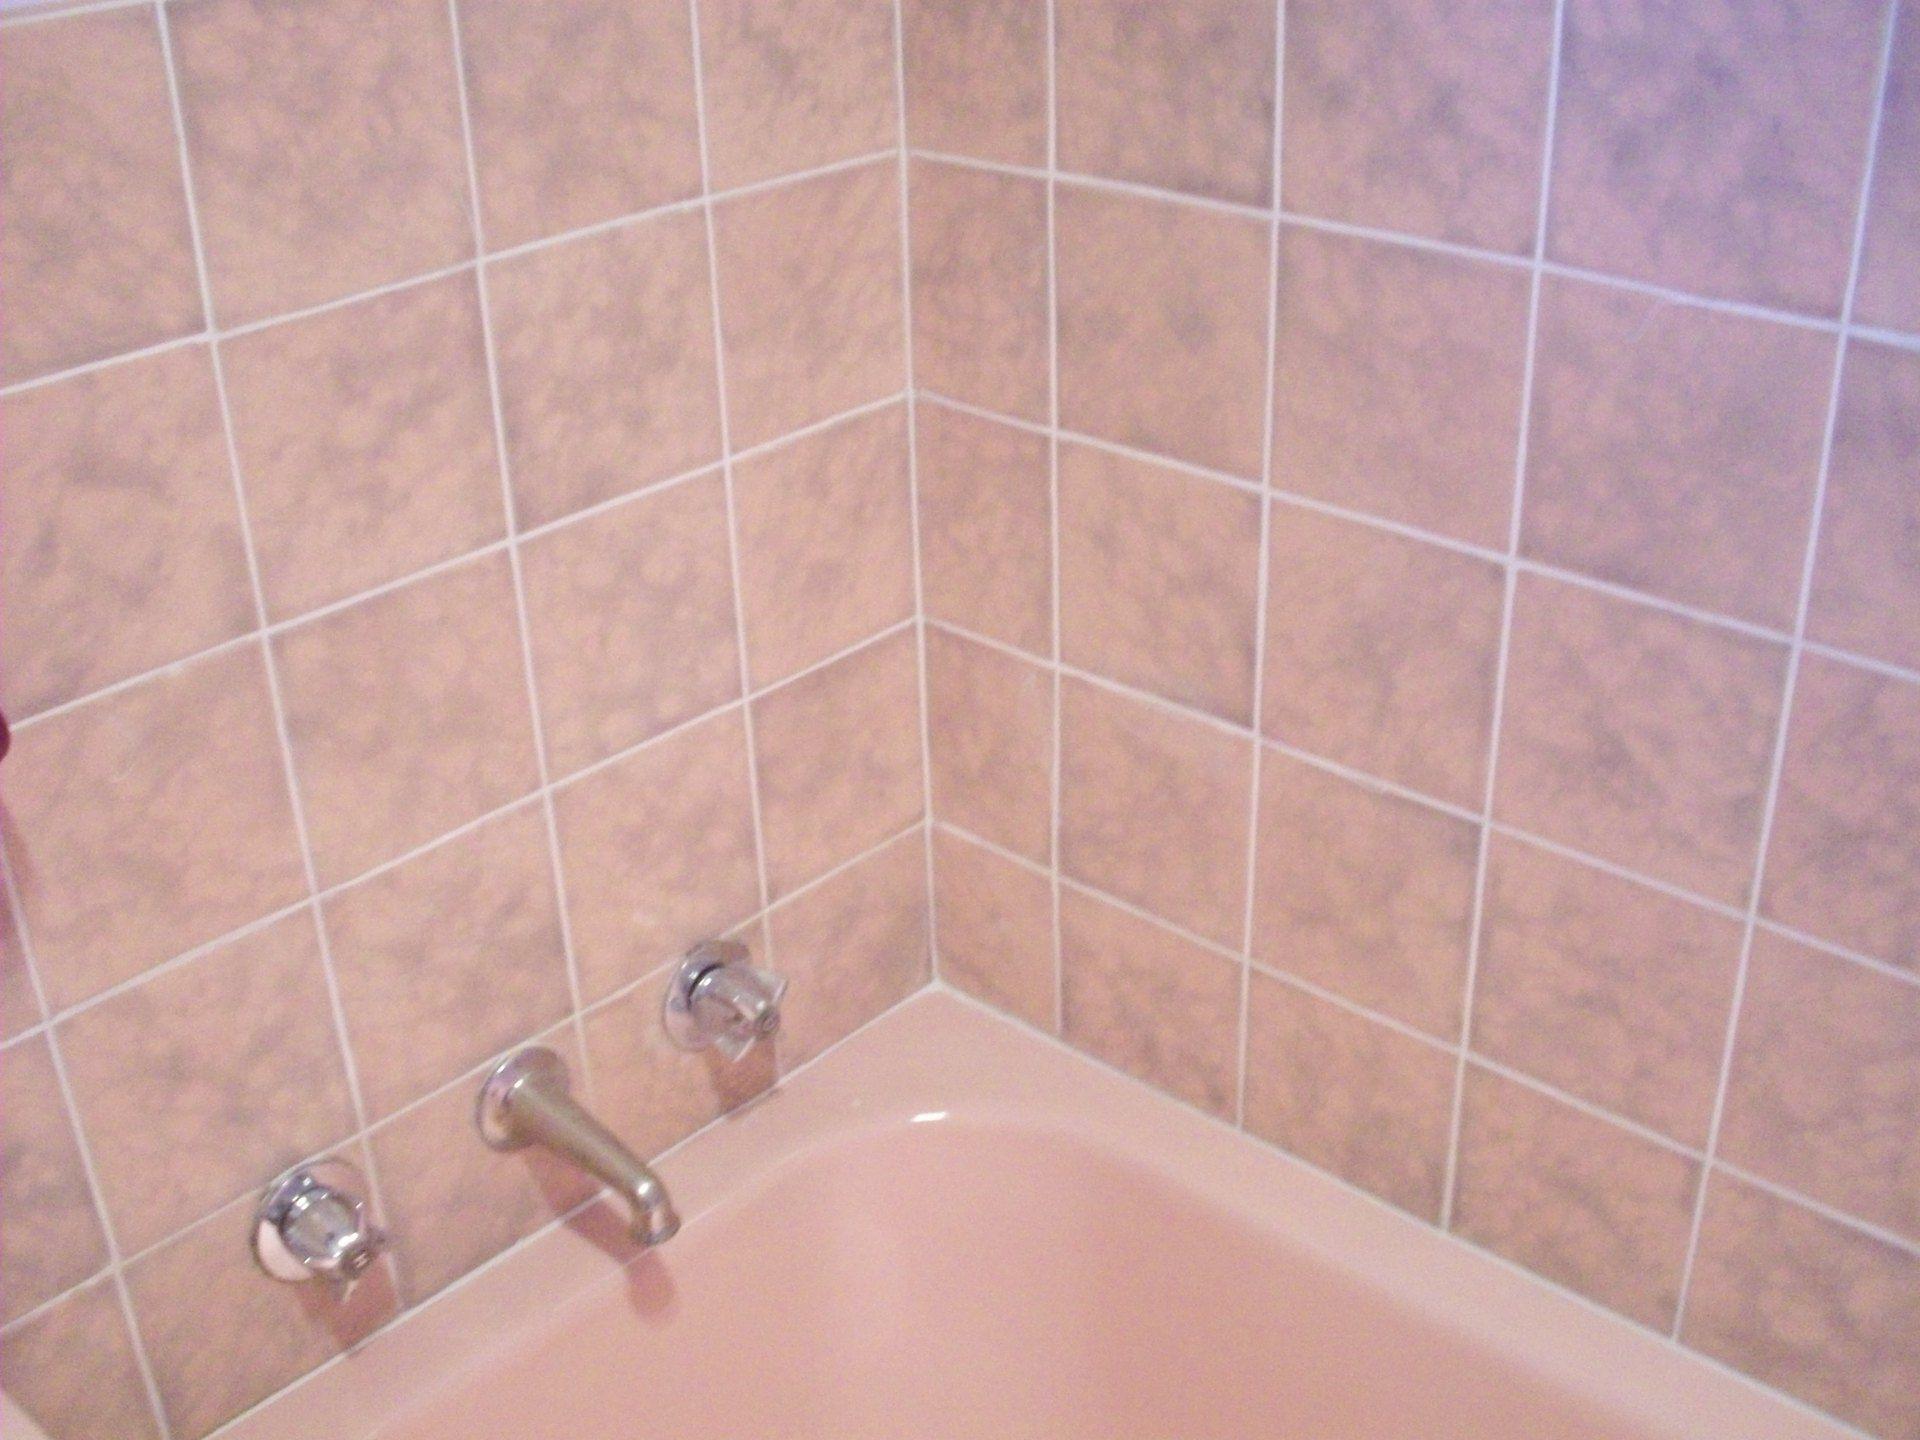 Tile Repair in 2020 | Shower repair, Tile repair, Shower ...